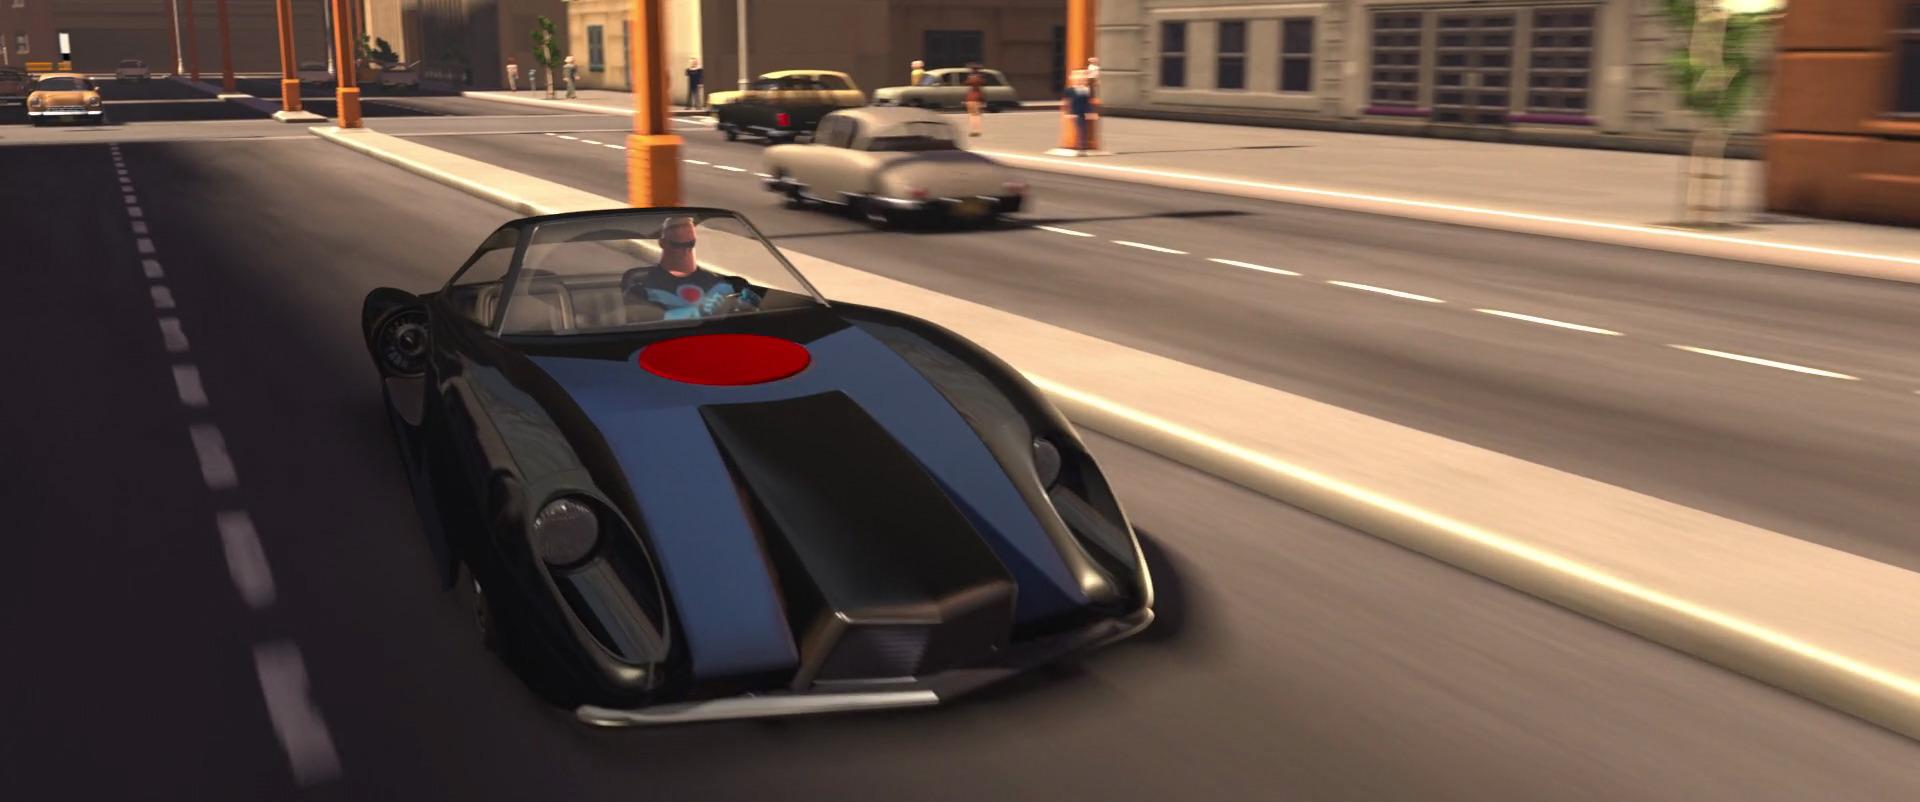 http://vignette4.wikia.nocookie.net/pixar/images/2/29/The-Incredibles-dsc-Incredimobile.jpg/revision/latest?cb=20130516005818